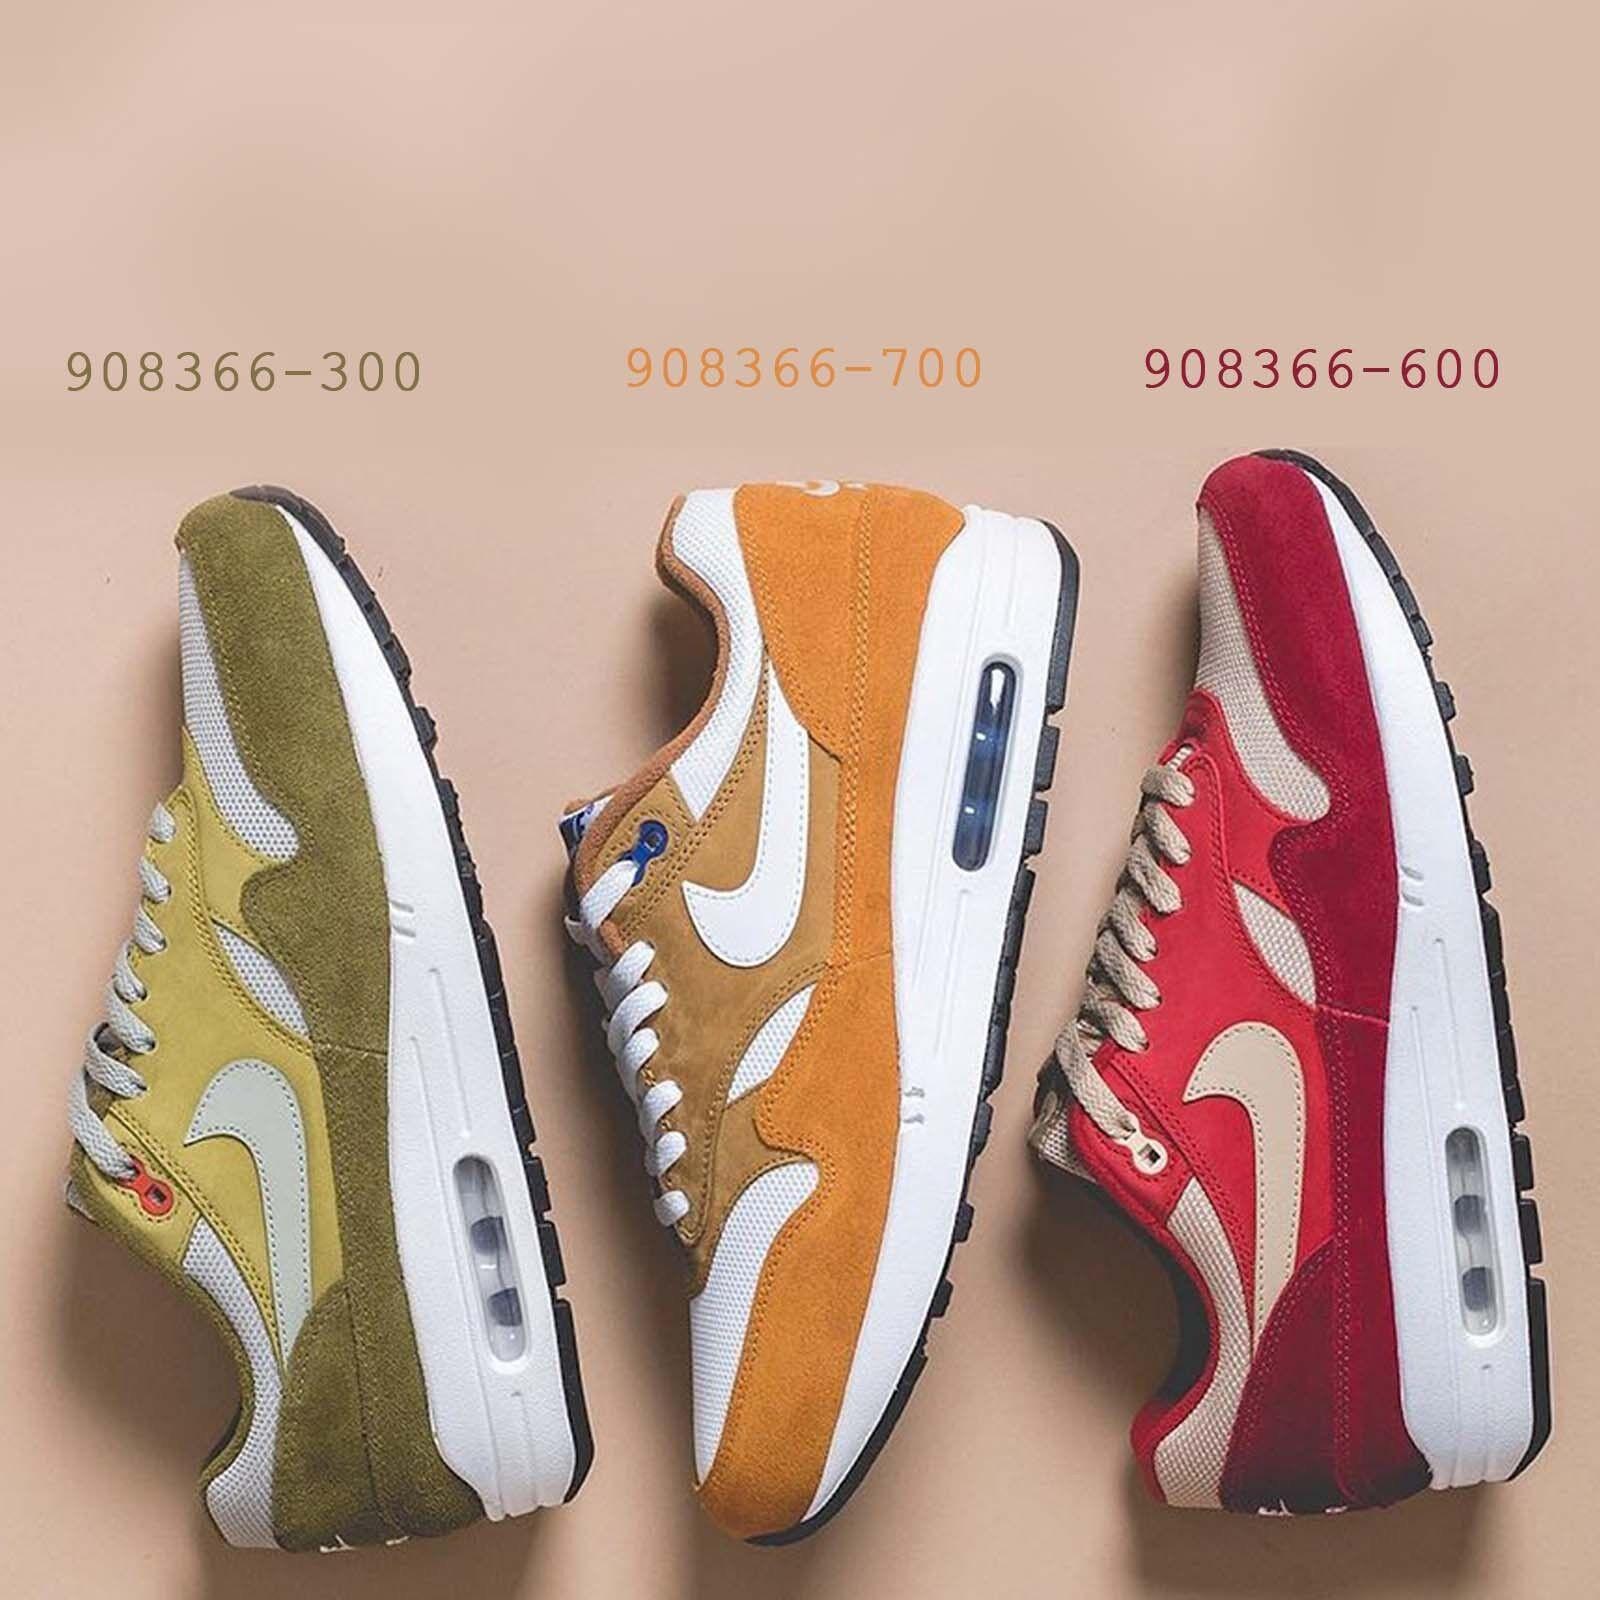 atmos X Nike Air Max 1 Premium Retro Curry Pack Red / Brown / Green Pick 1